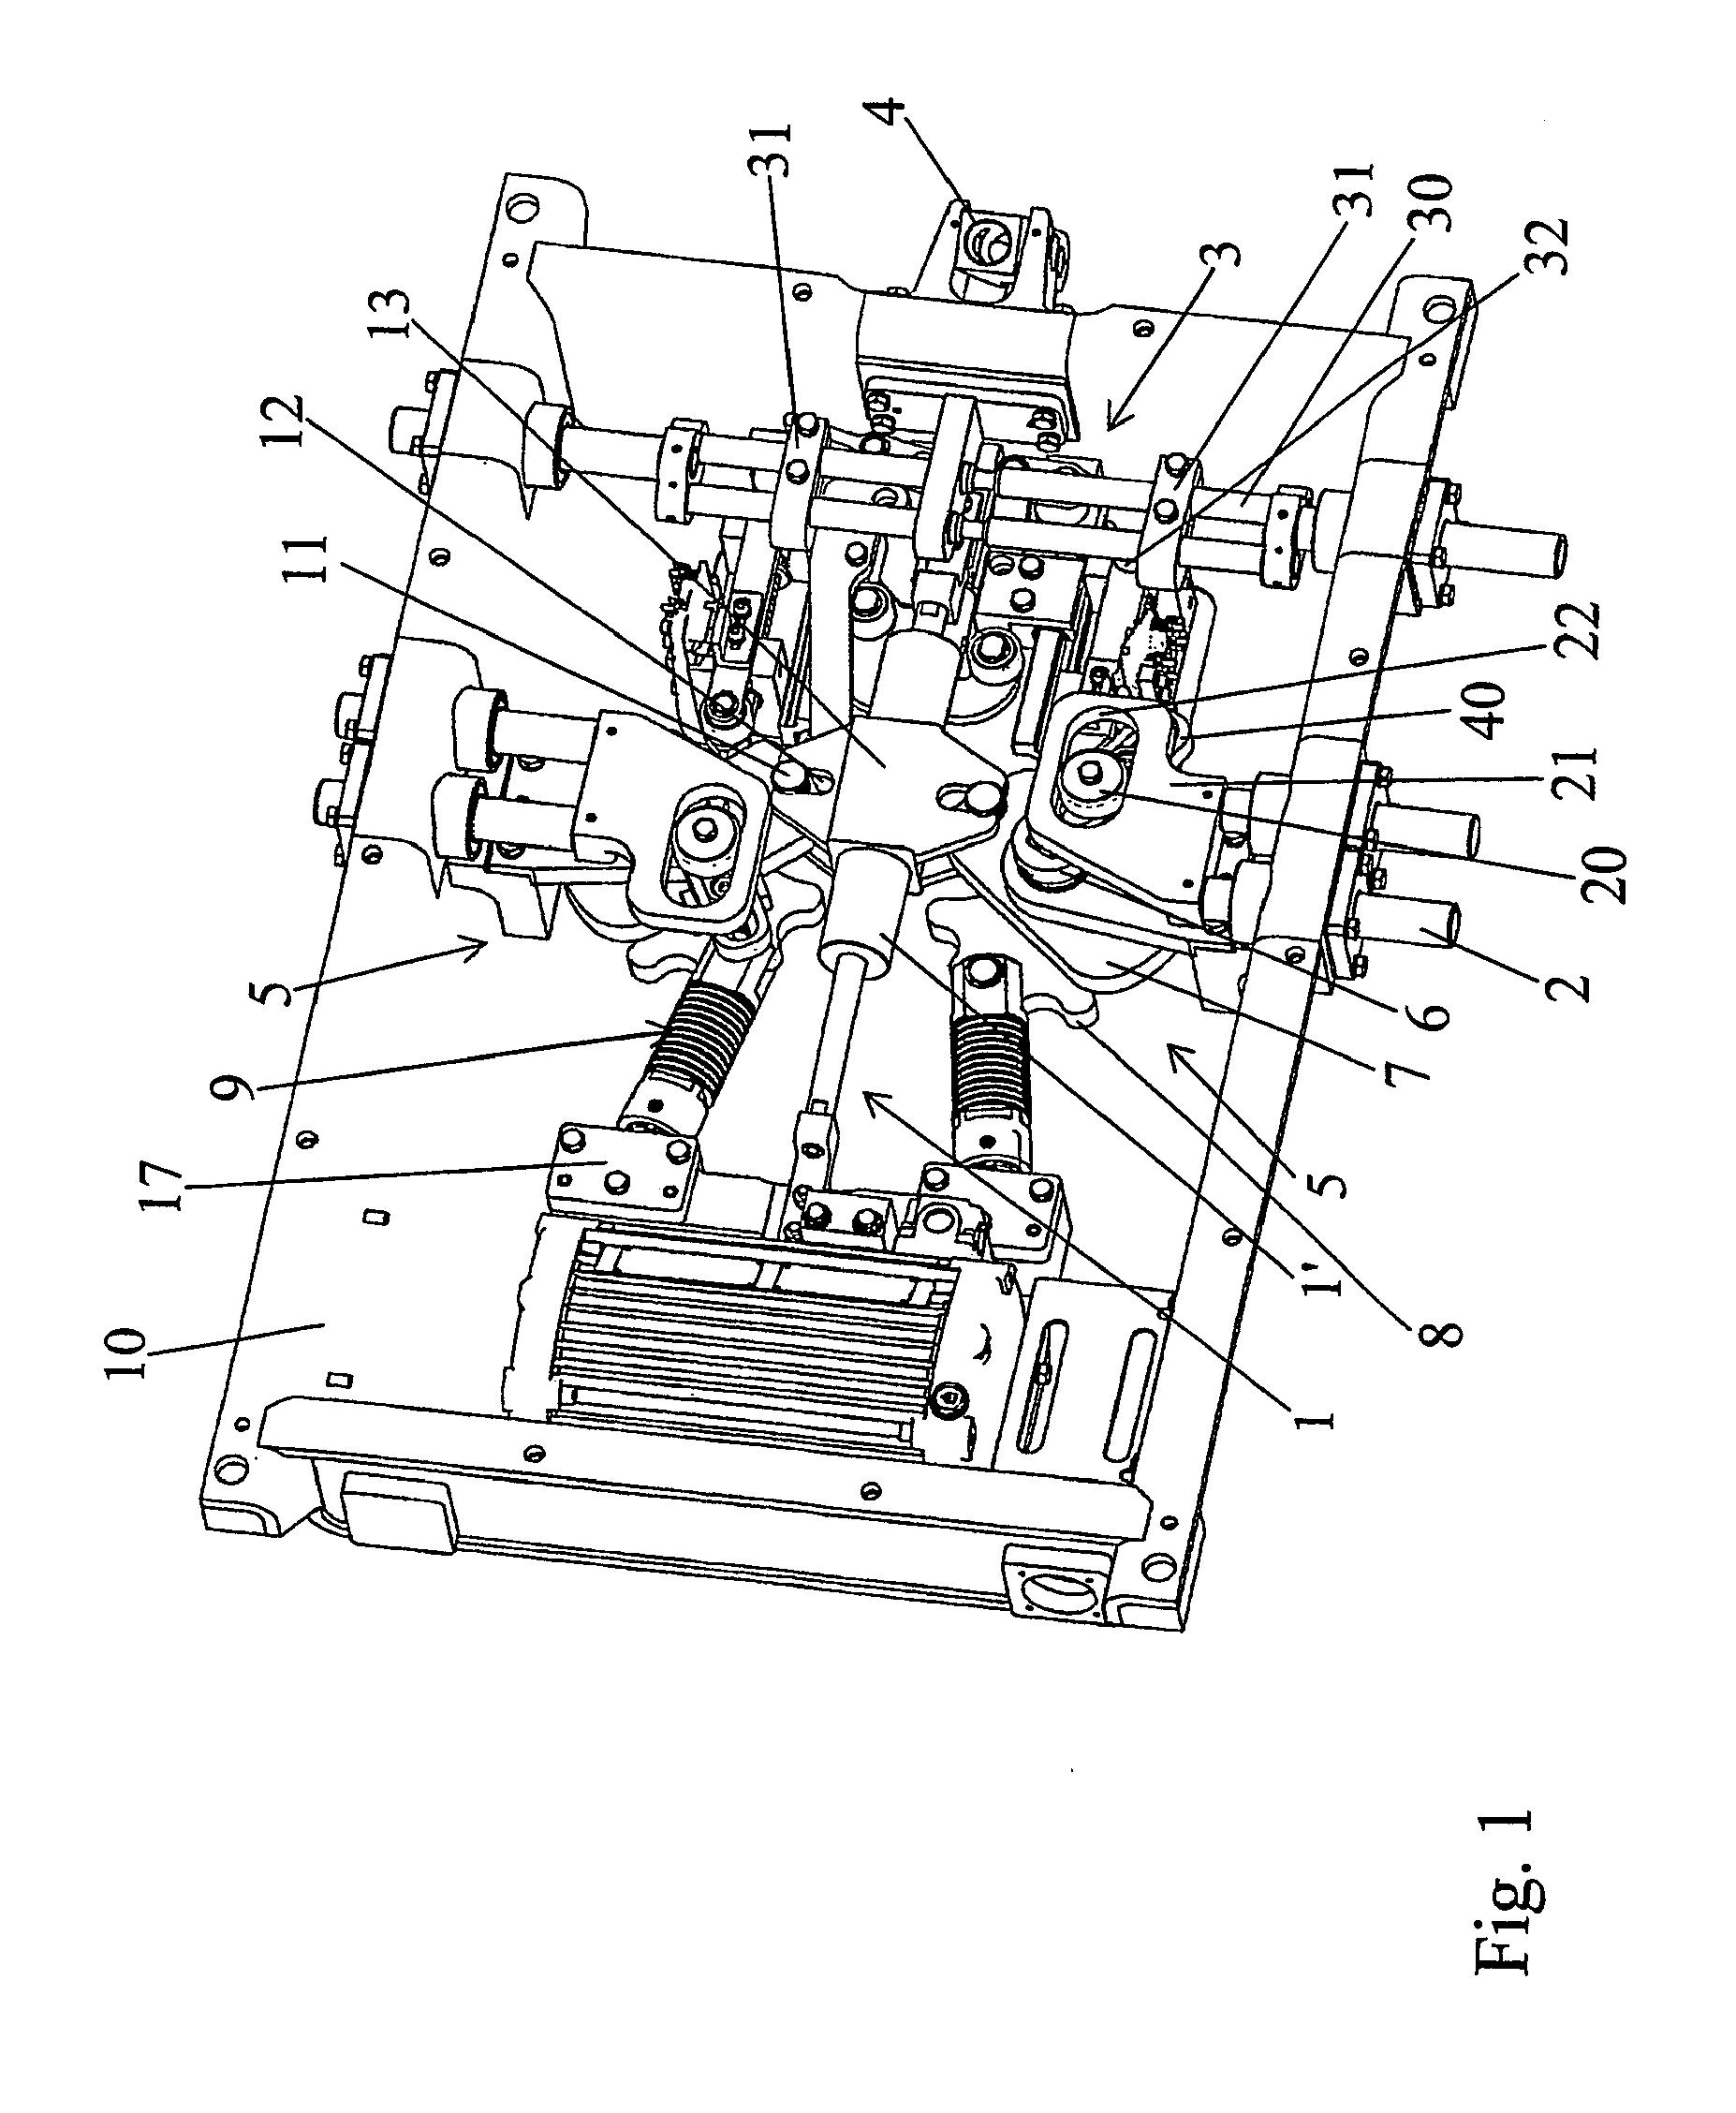 patent ep2069184b1